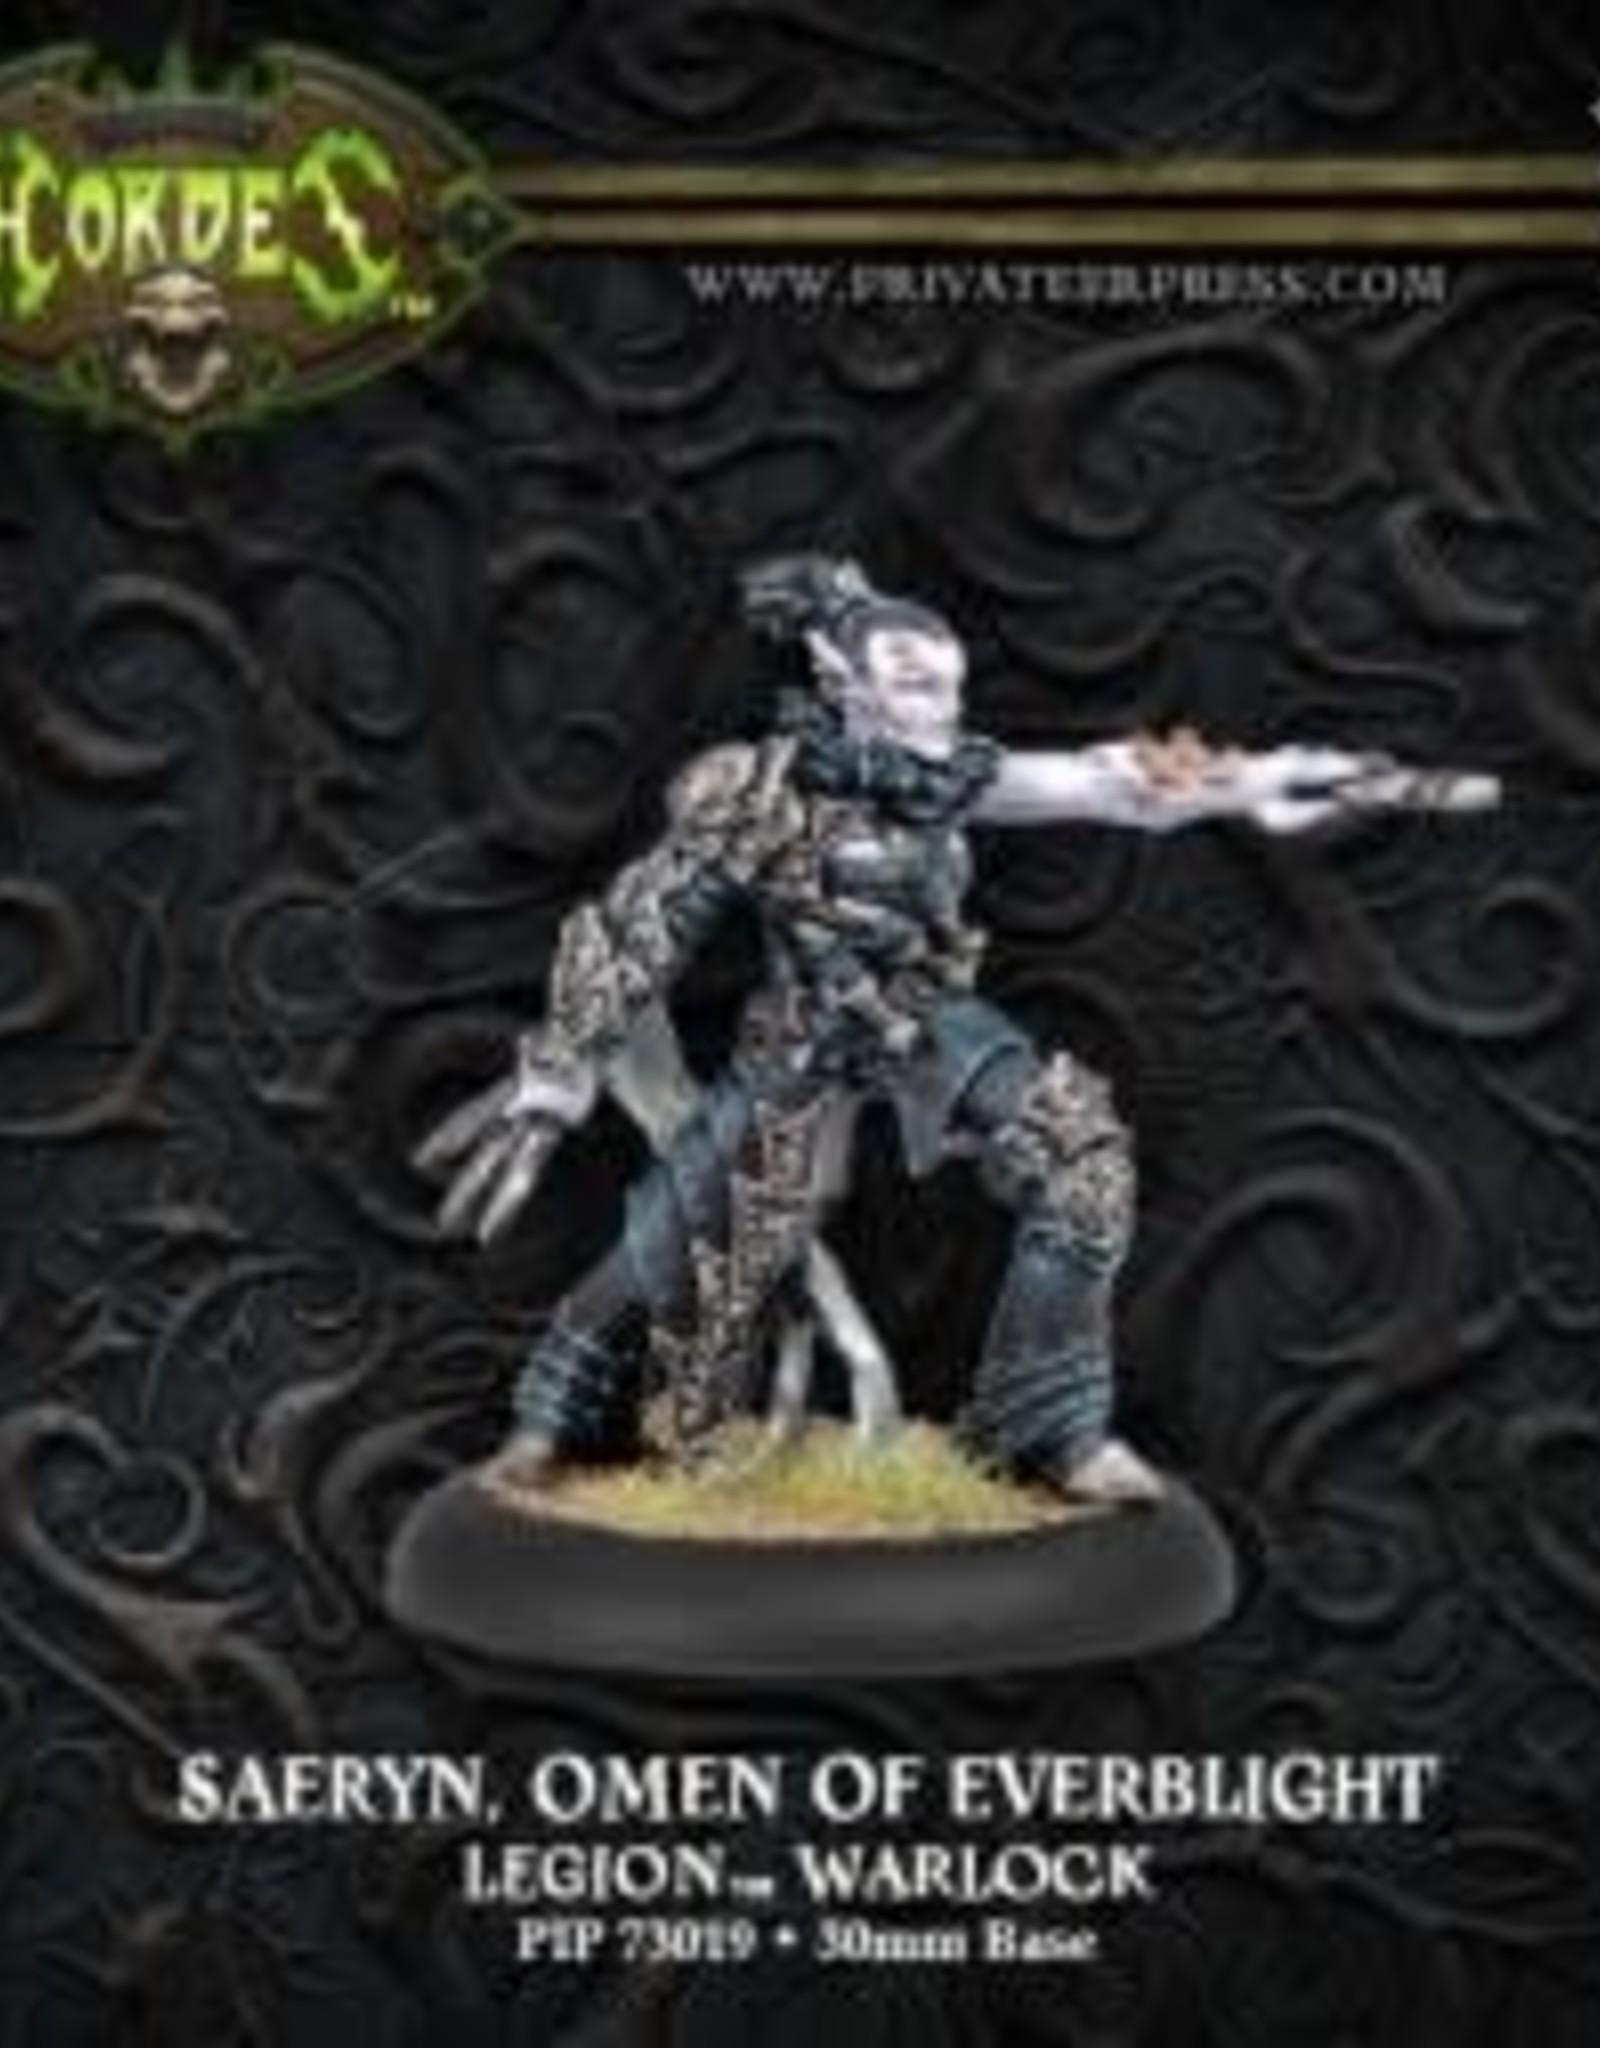 Hordes Everblight - Saeryn Omen of Everblight